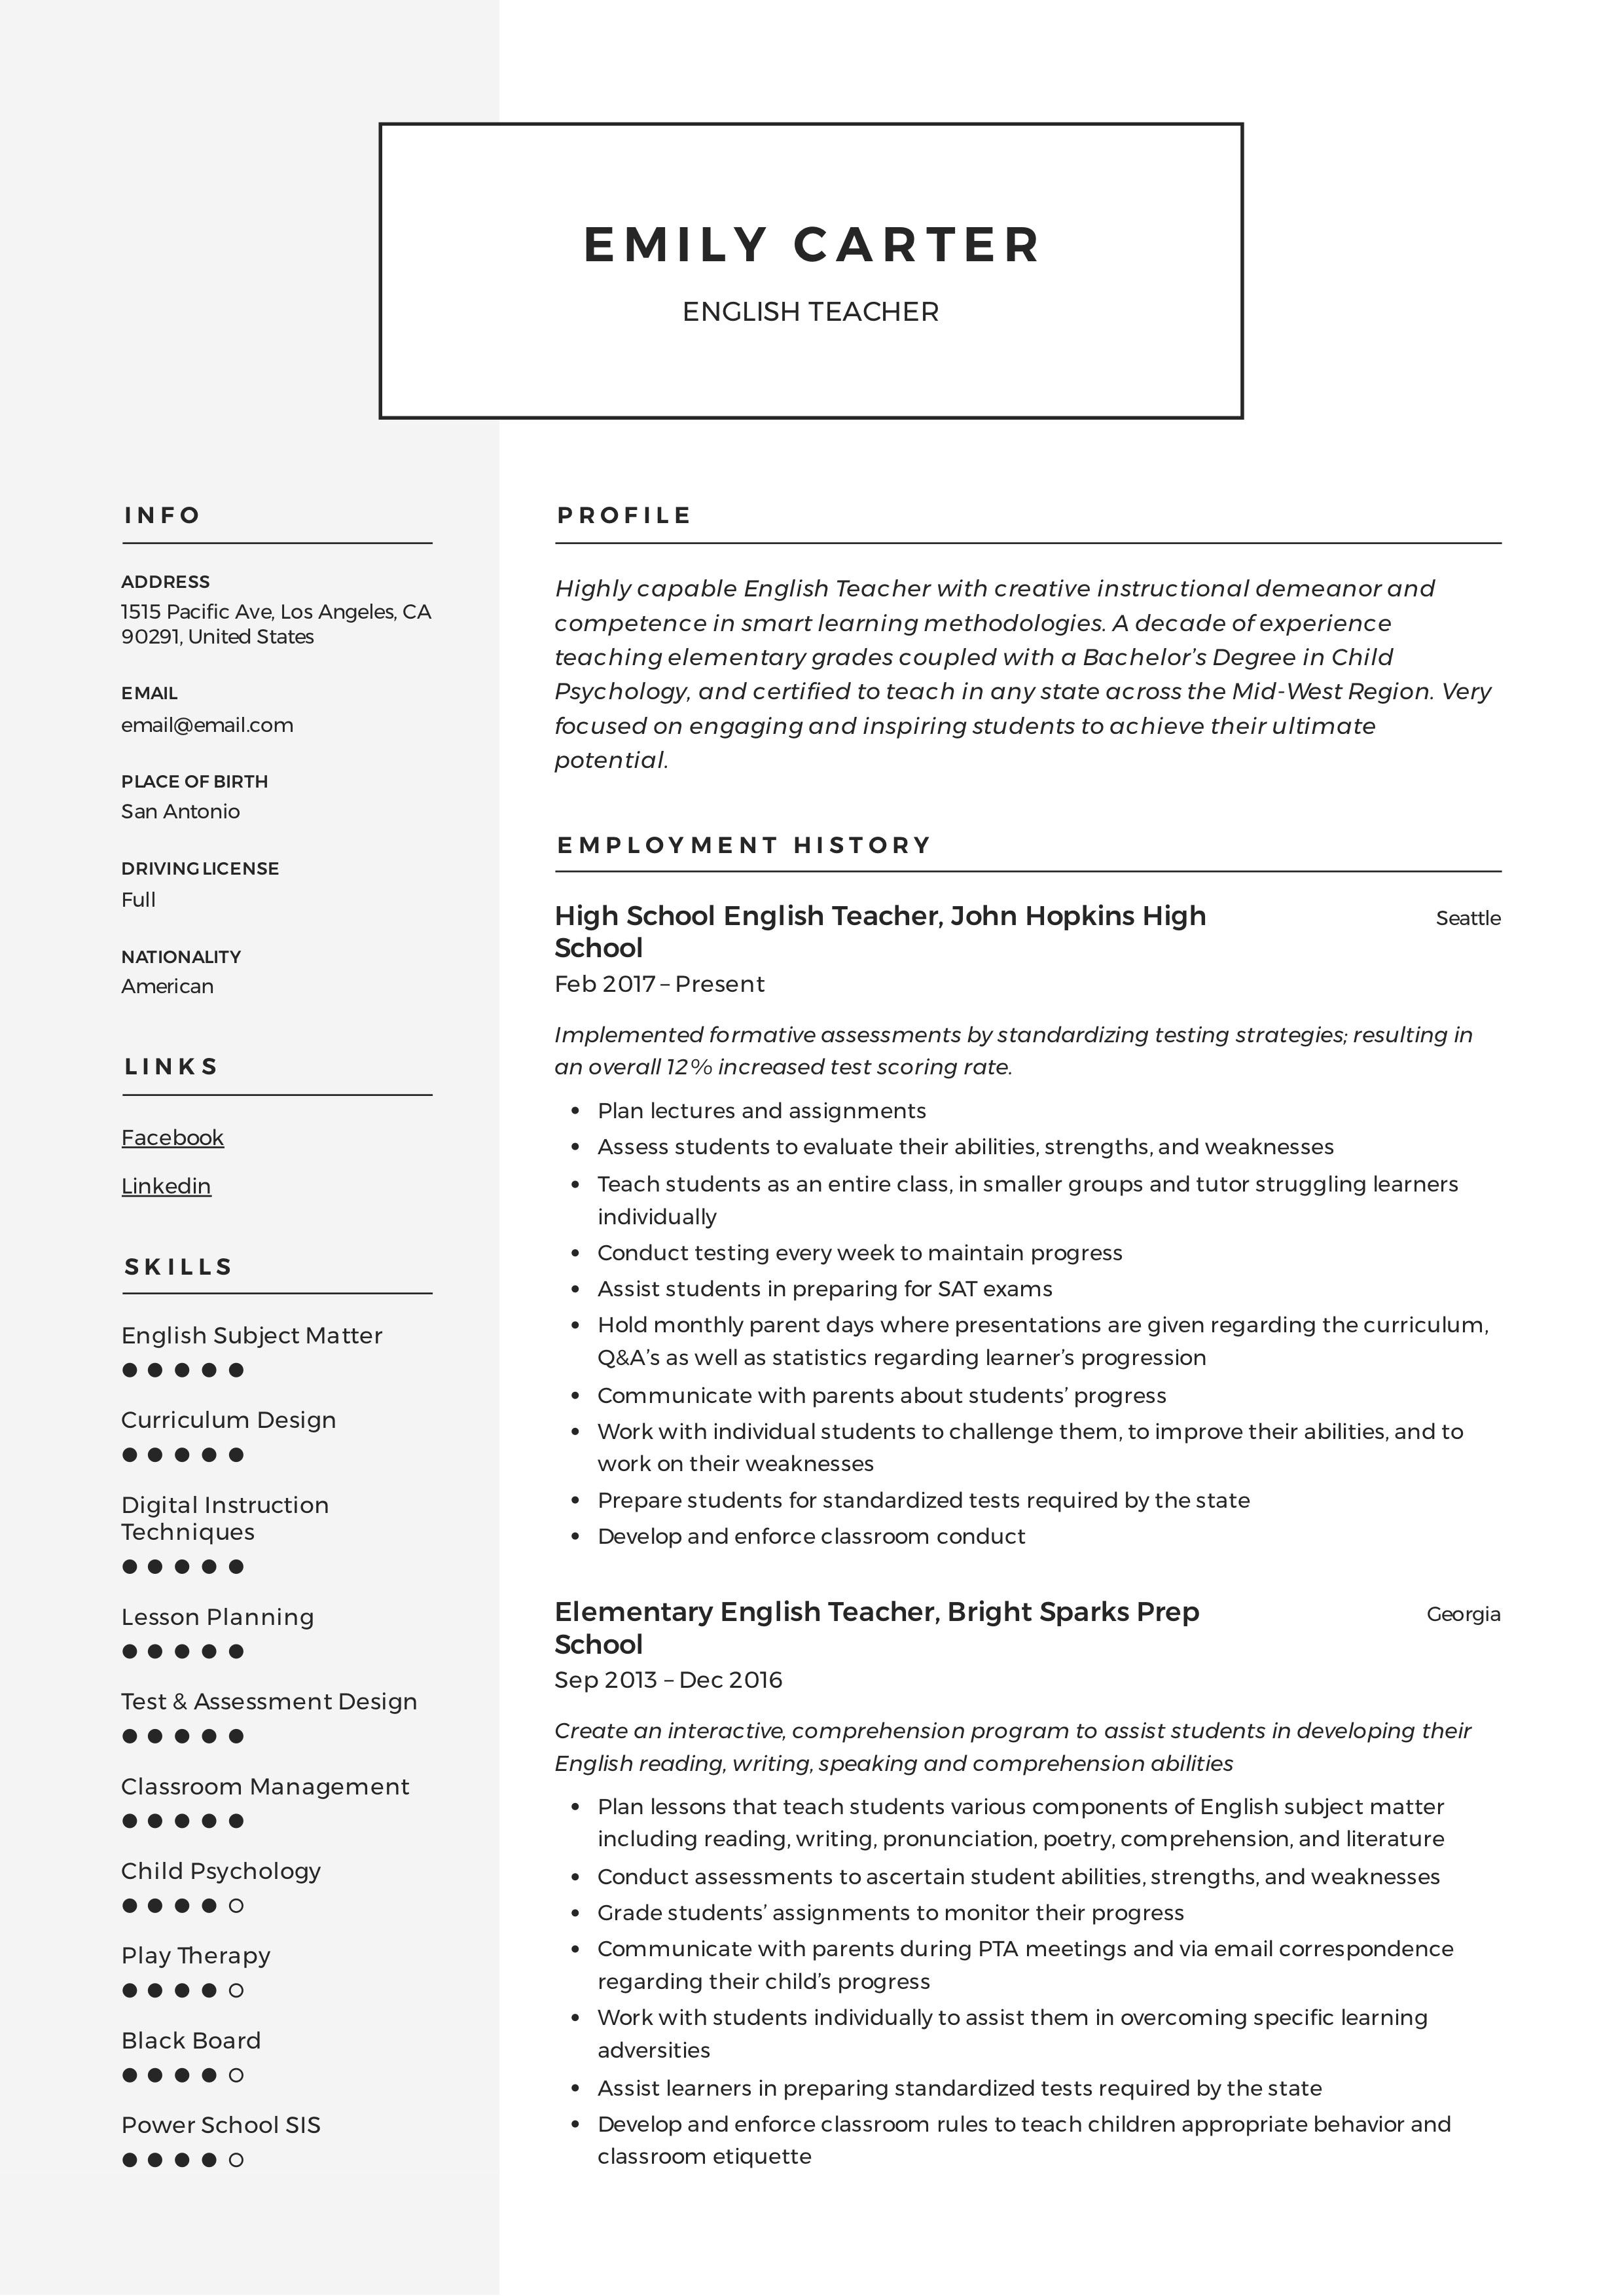 resume template modern 2